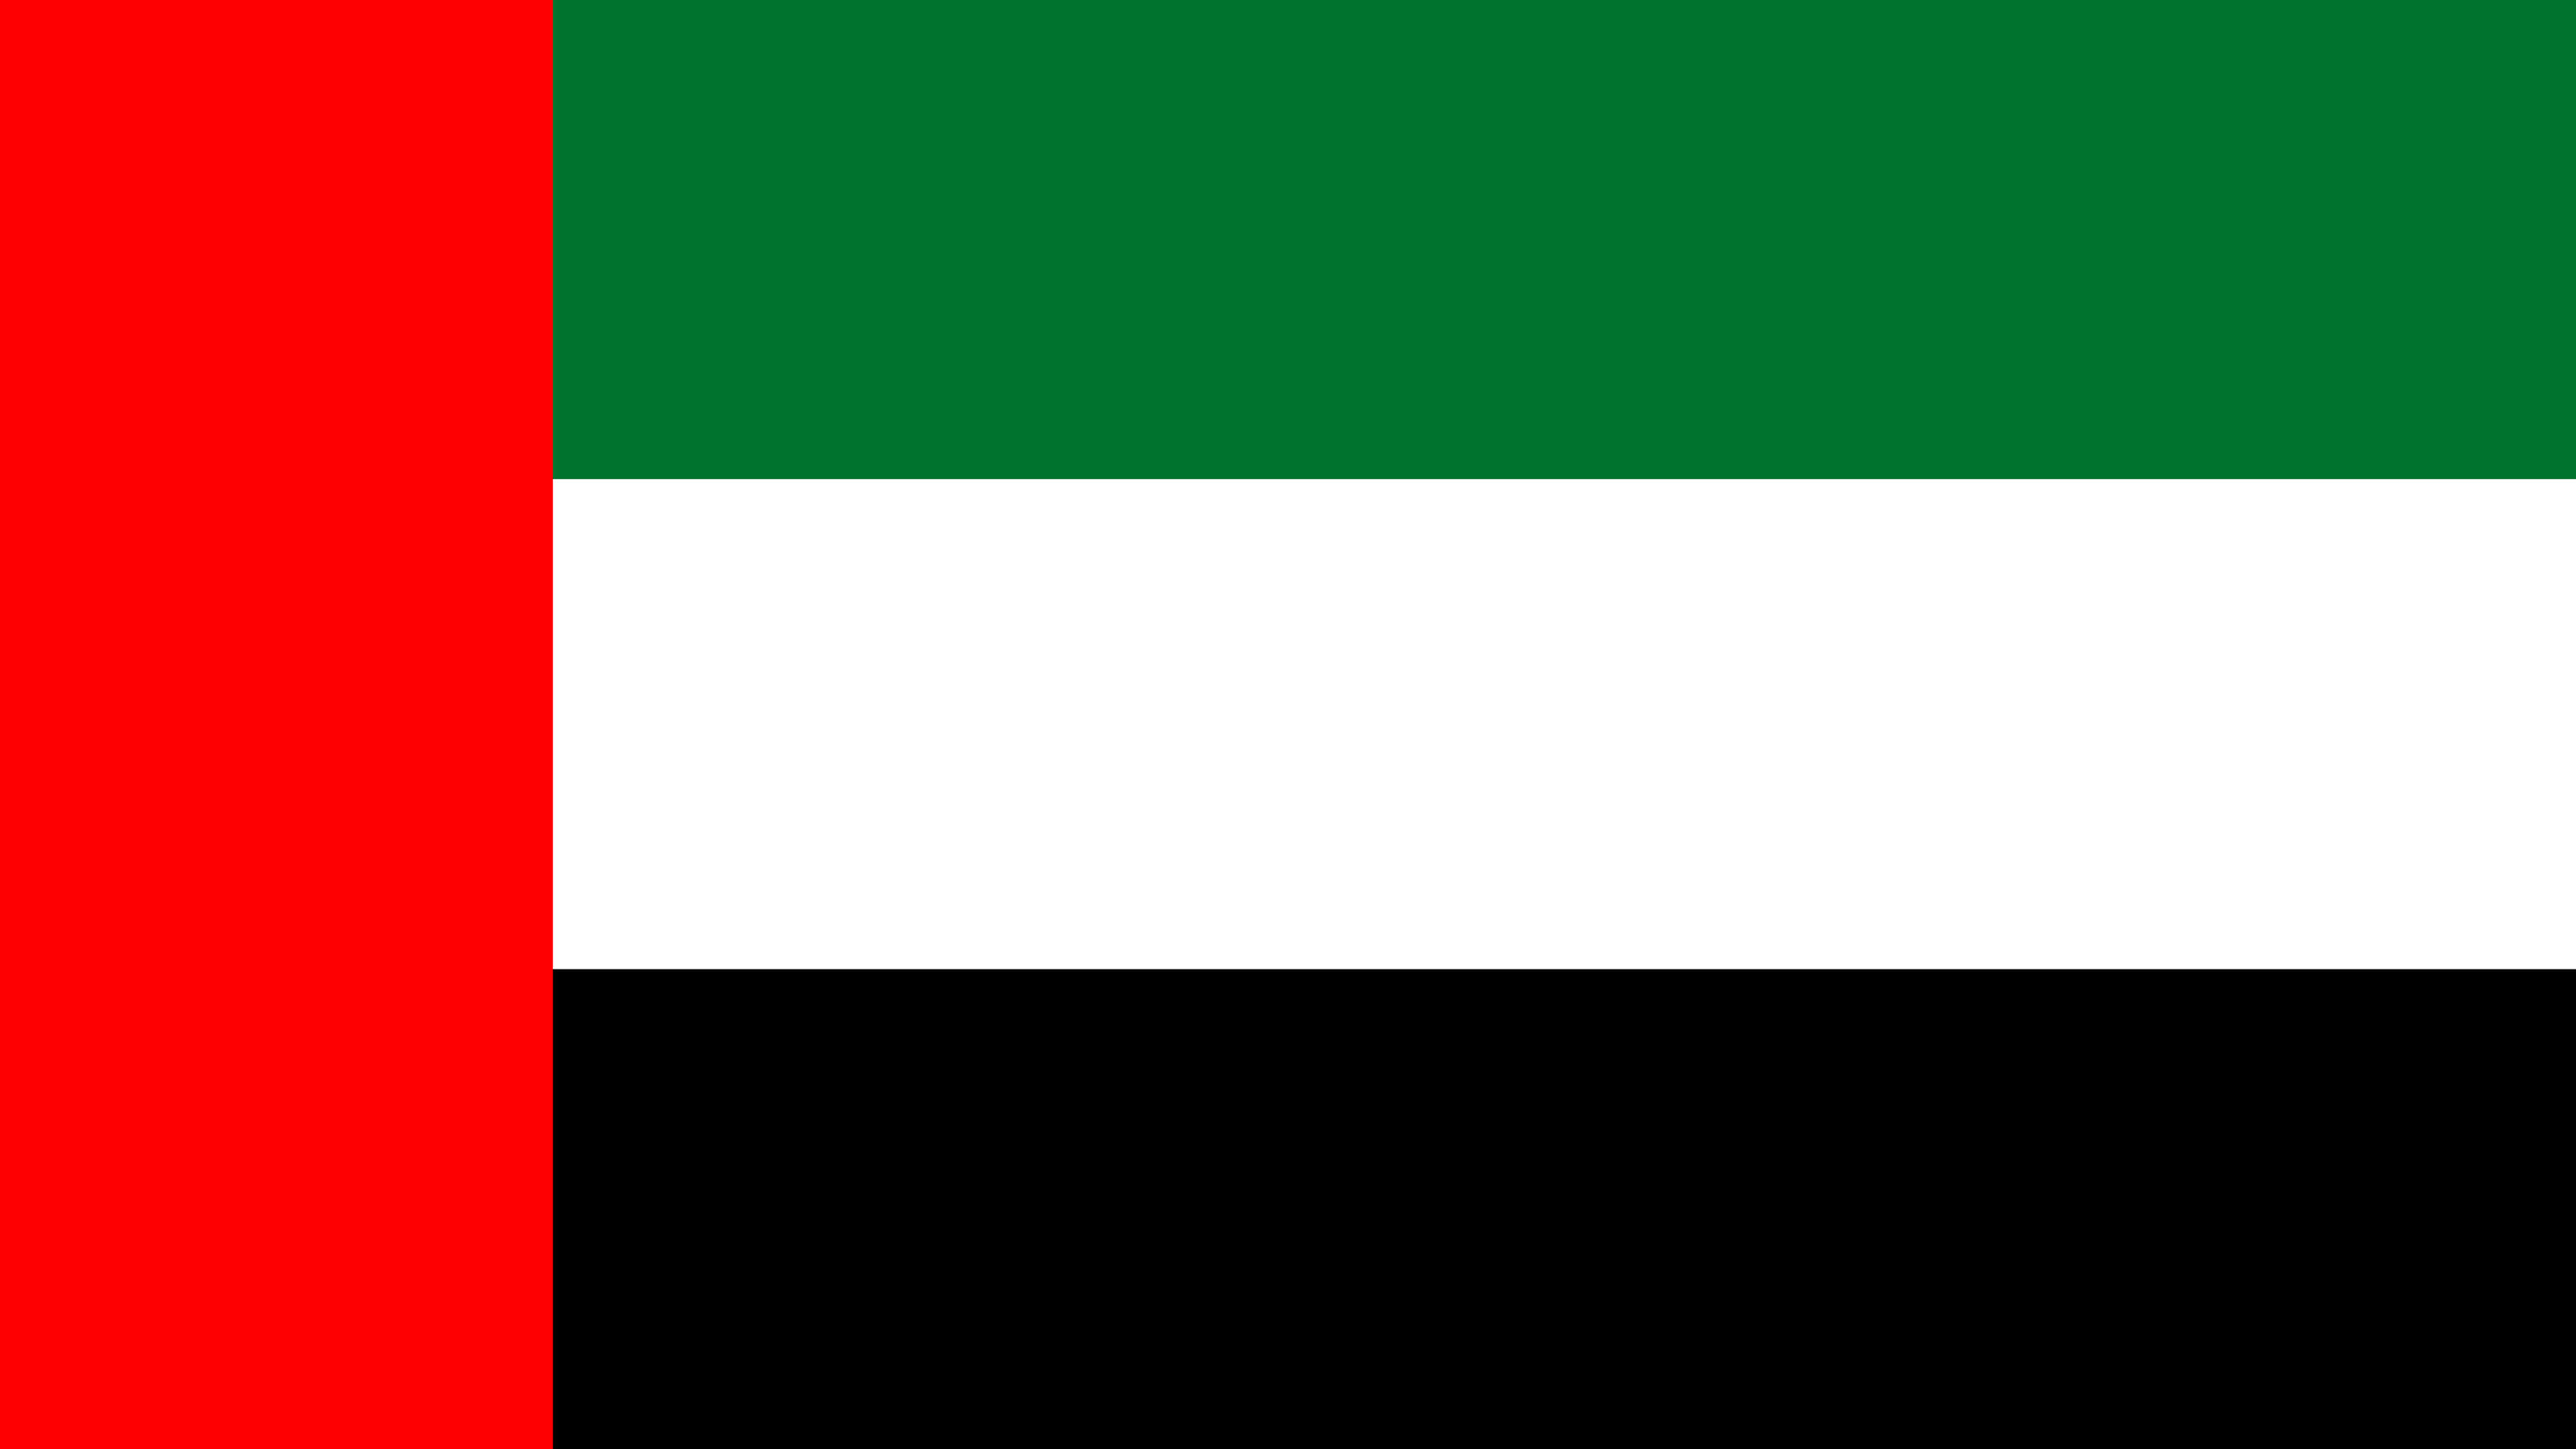 united arab emirates flag uhd 4k wallpaper